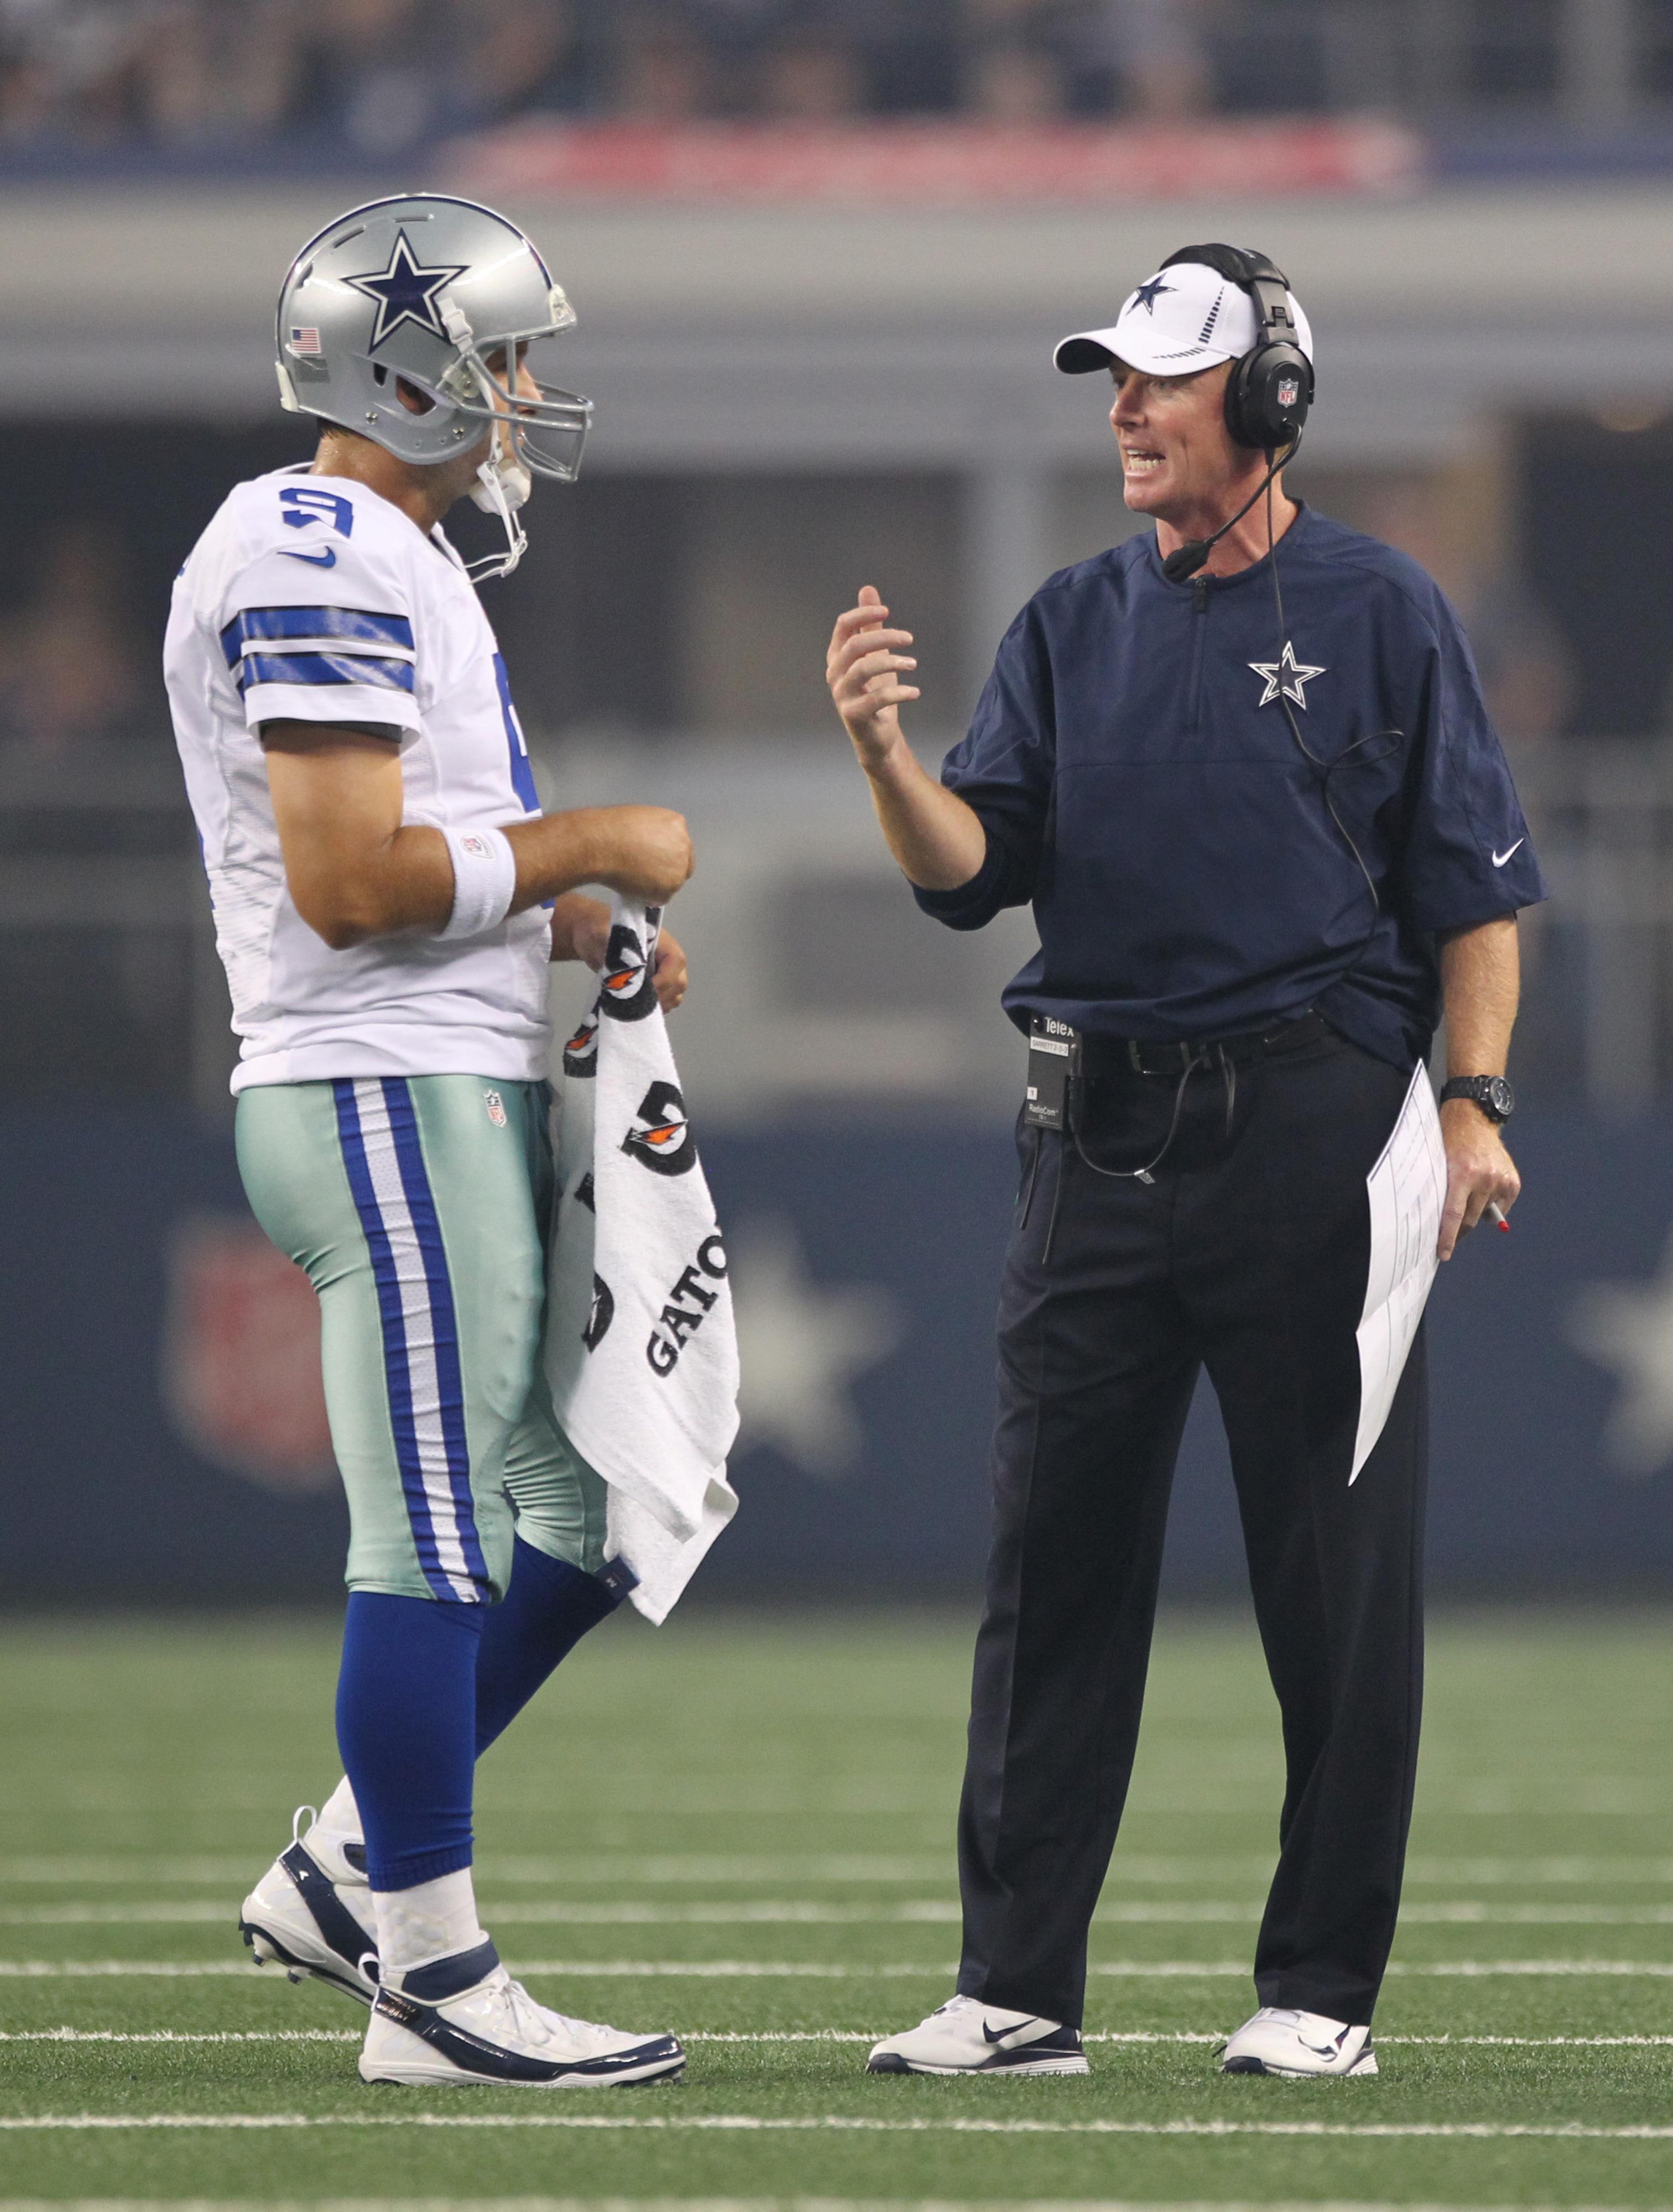 Aug 25, 2012; Arlington, TX, USA; Dallas Cowboys quarterback Tony Romo (9) talks with head coach Jason Garrett during the game against the St Louis Rams at Cowboys Stadium. Mandatory Credit: Matthew Emmons-US PRESSWIRE